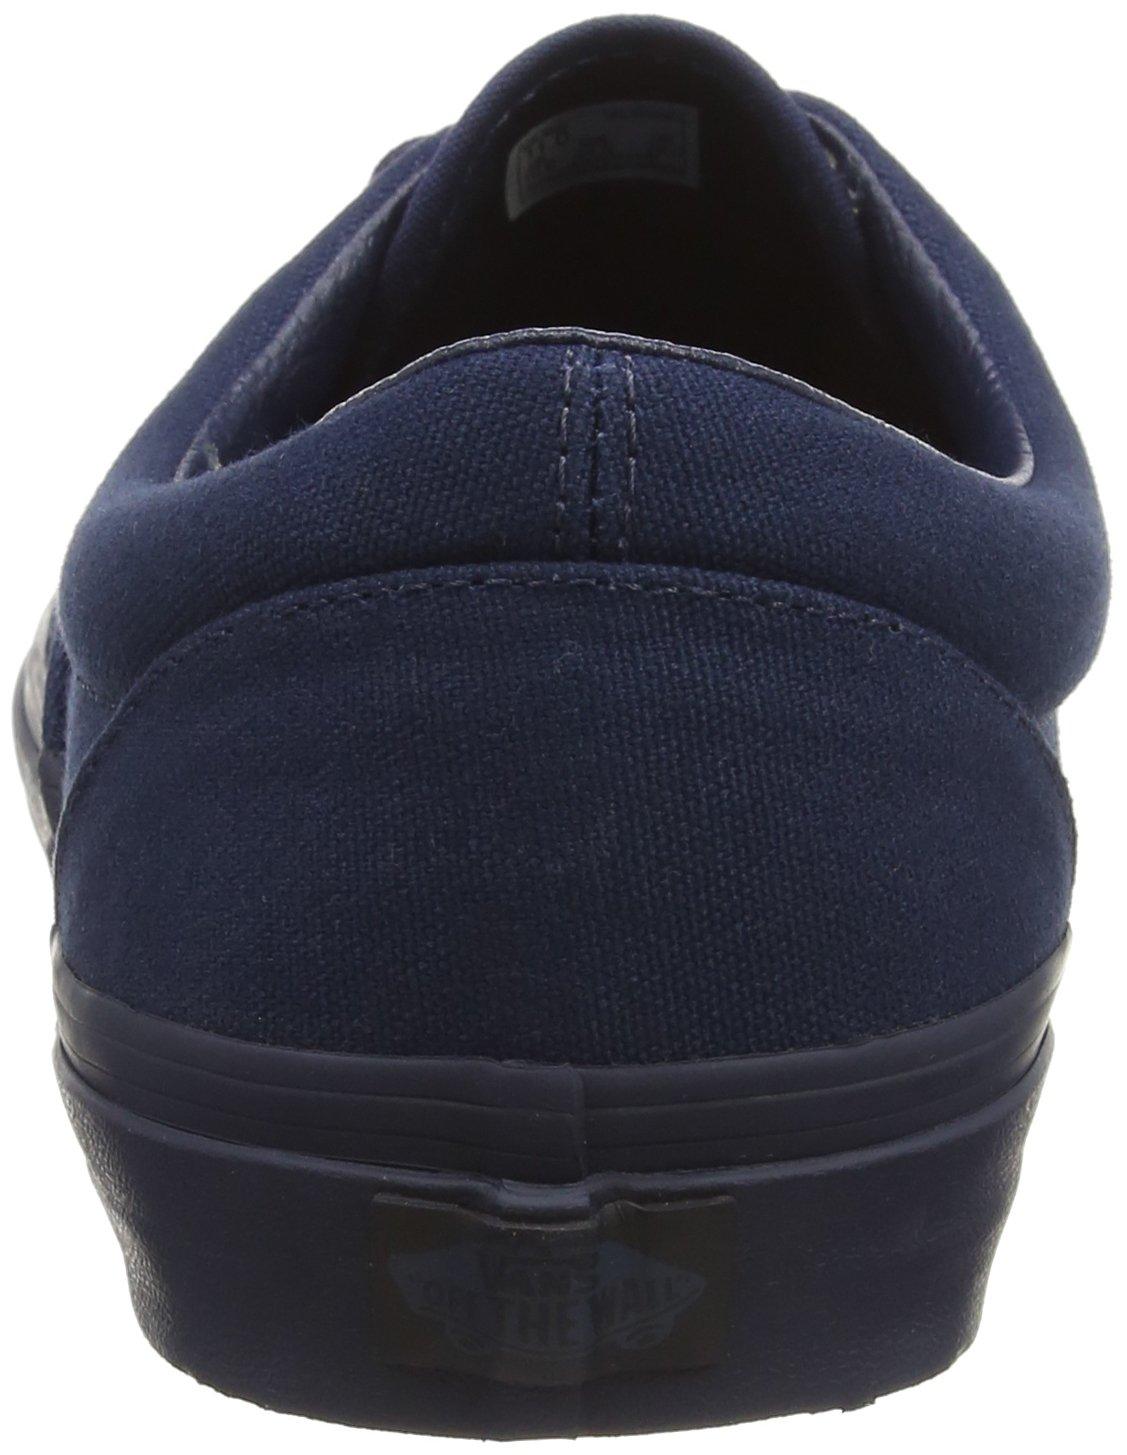 Vans Unisex Era Skate Shoes, Classic Durable Low-Top Lace-up Style in Durable Classic Double-Stitched Canvas and Original Waffle Outsole B019FVT38O 7 B(M) US Women / 5.5 D(M) US Men|Dress Blue 17e480